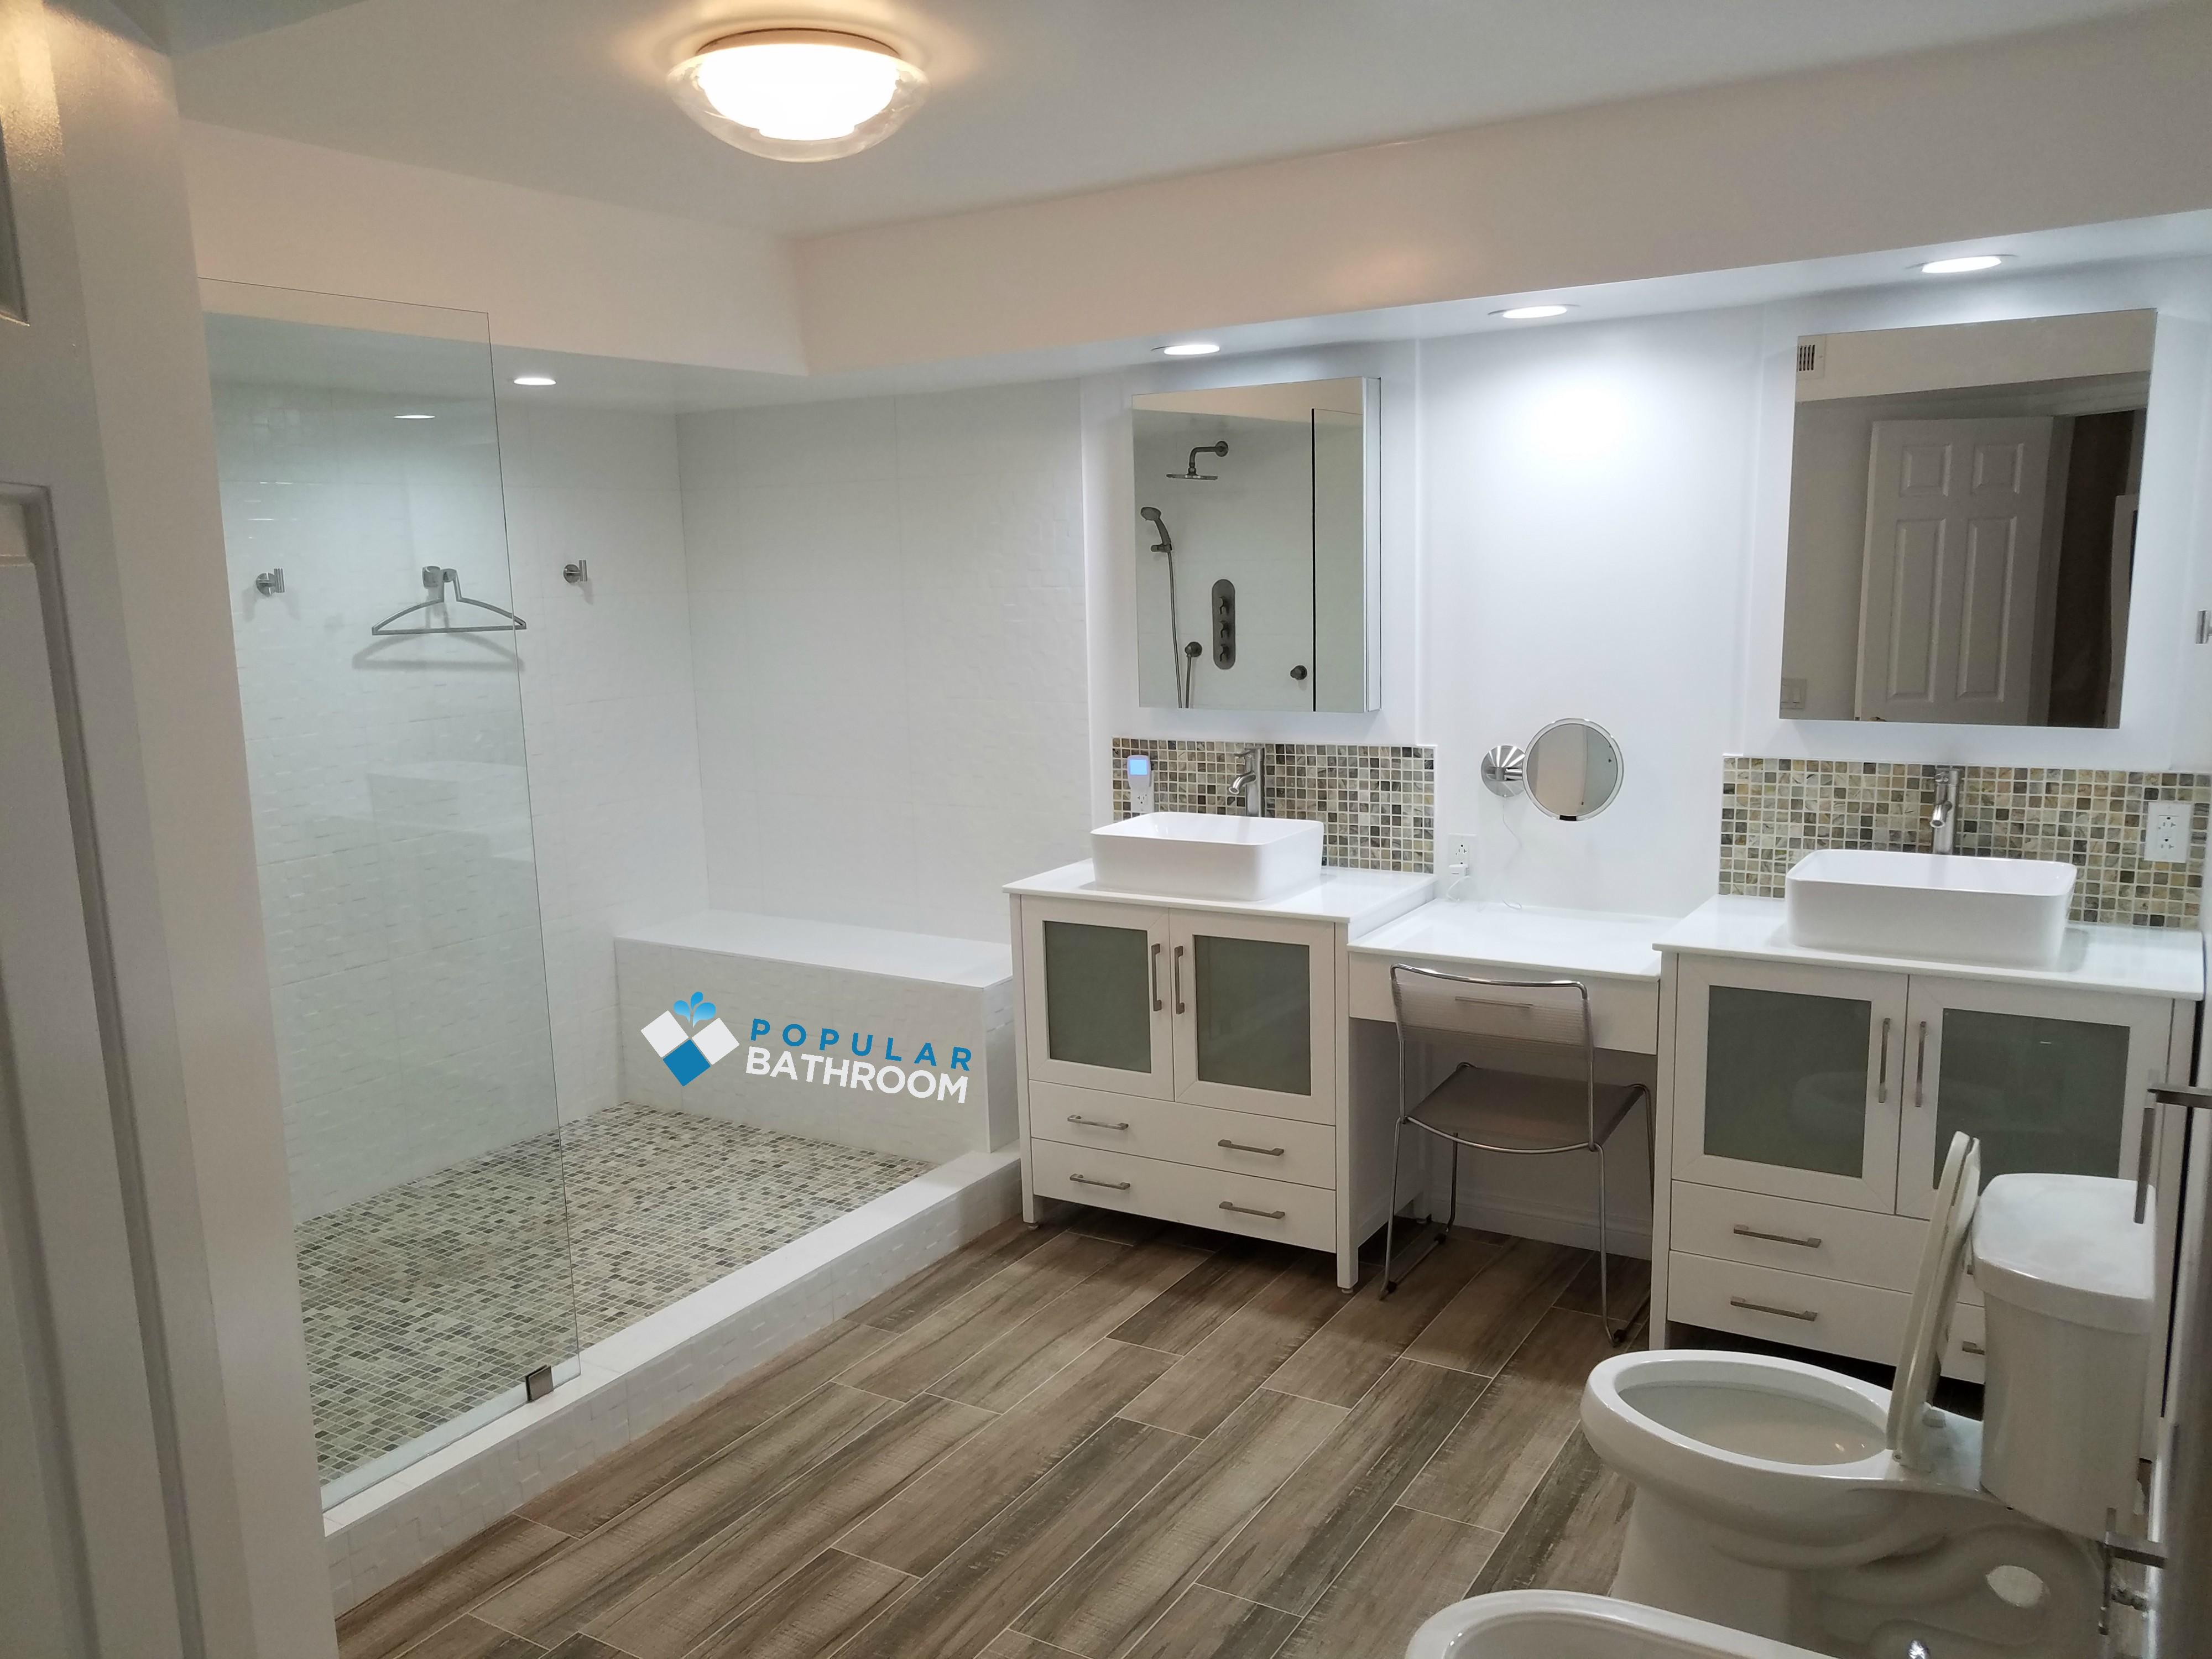 Popular Bathroom image 39